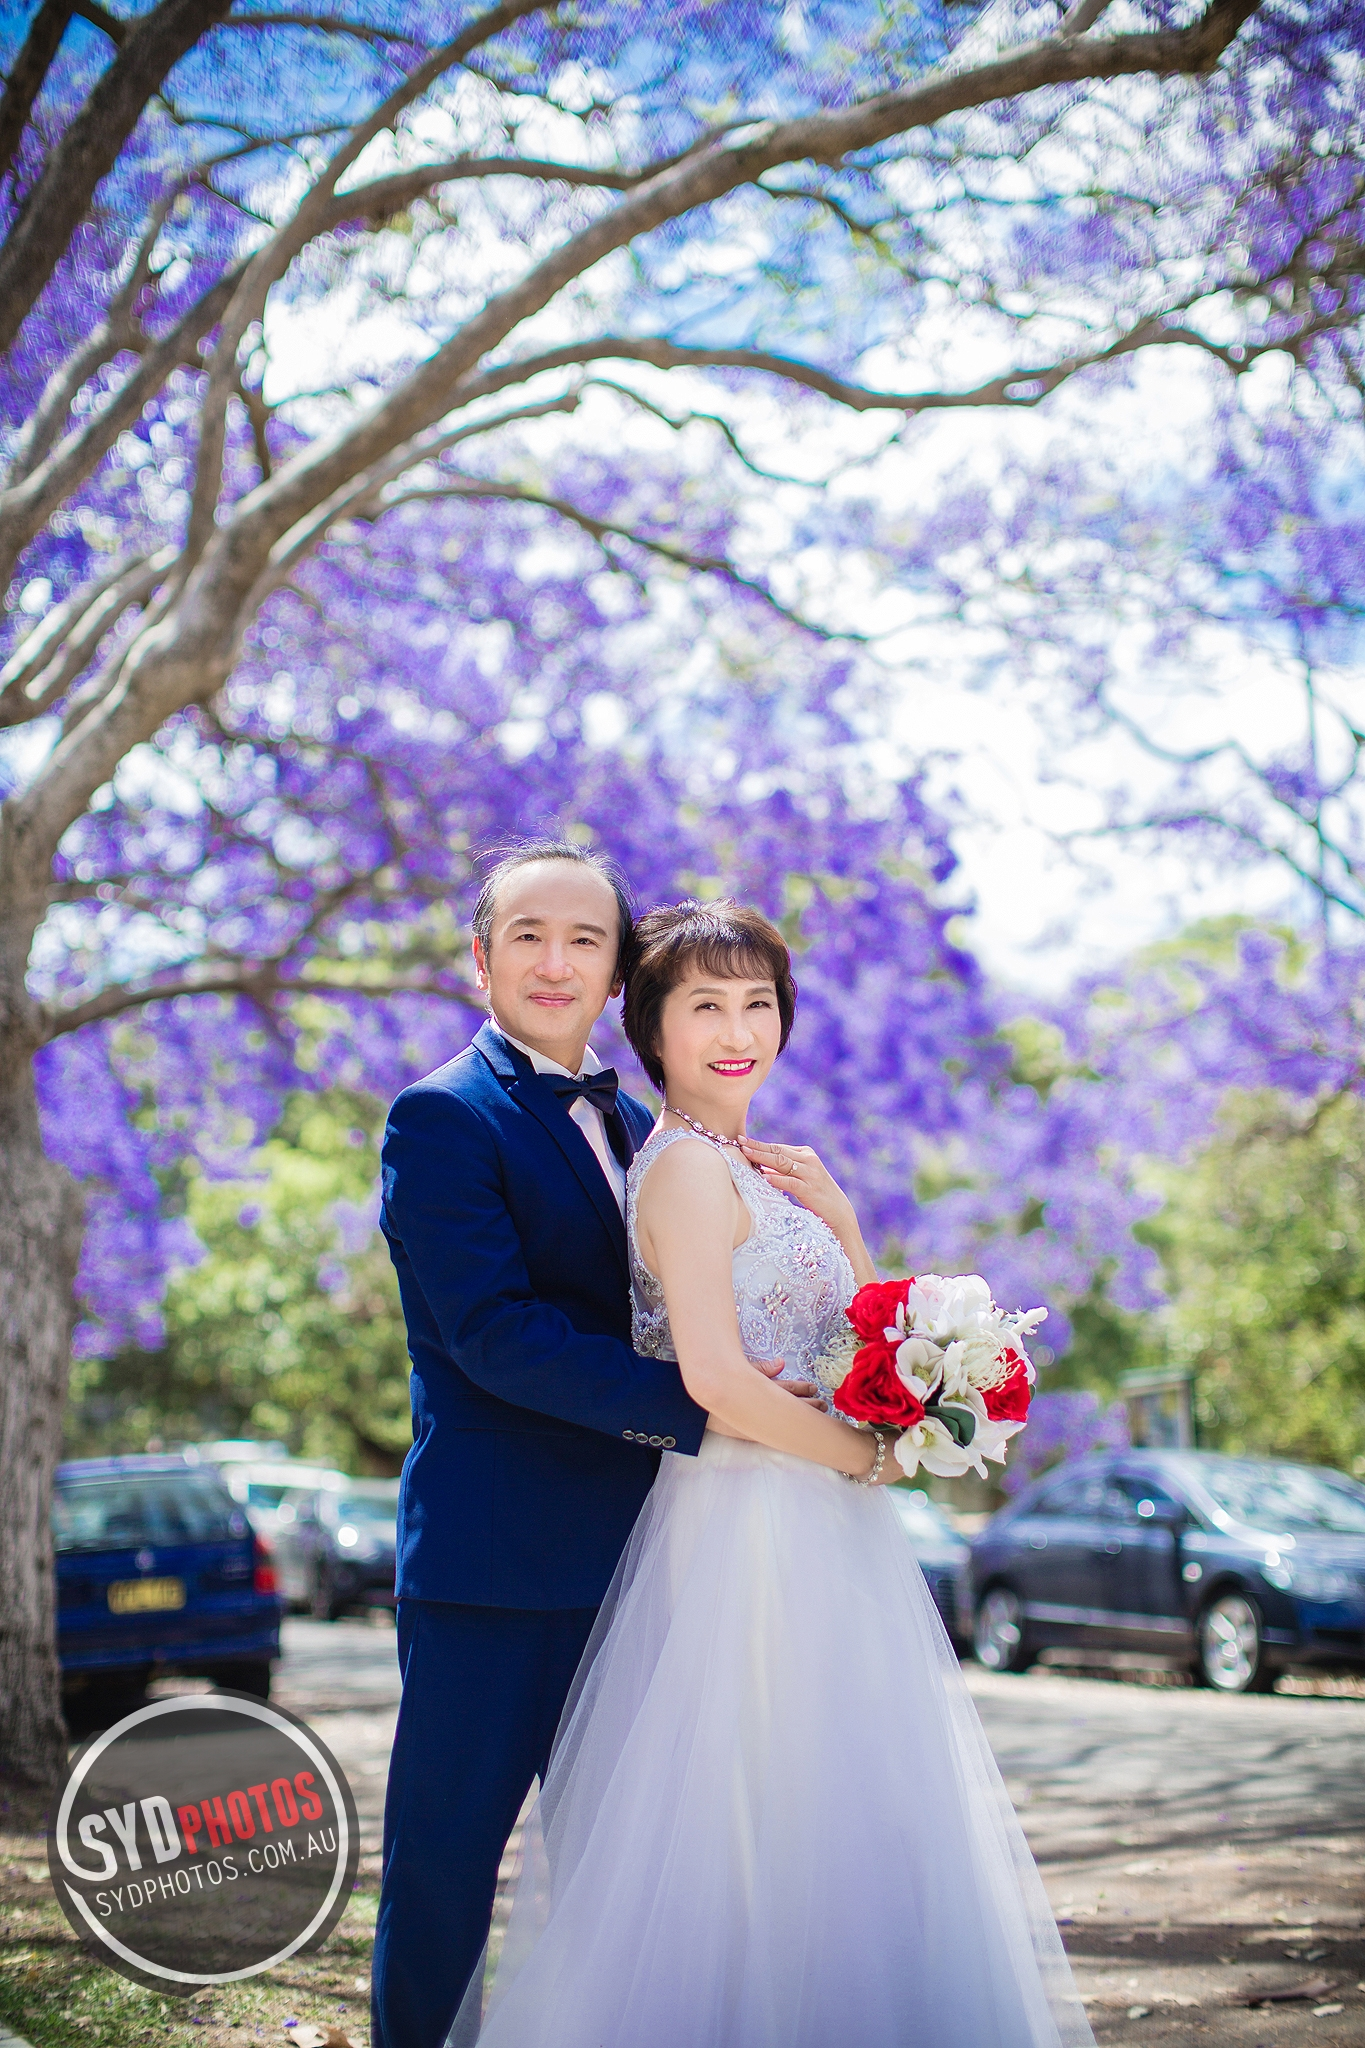 ID-89814-Elaine-Prewedding-悉尼婚纱摄影